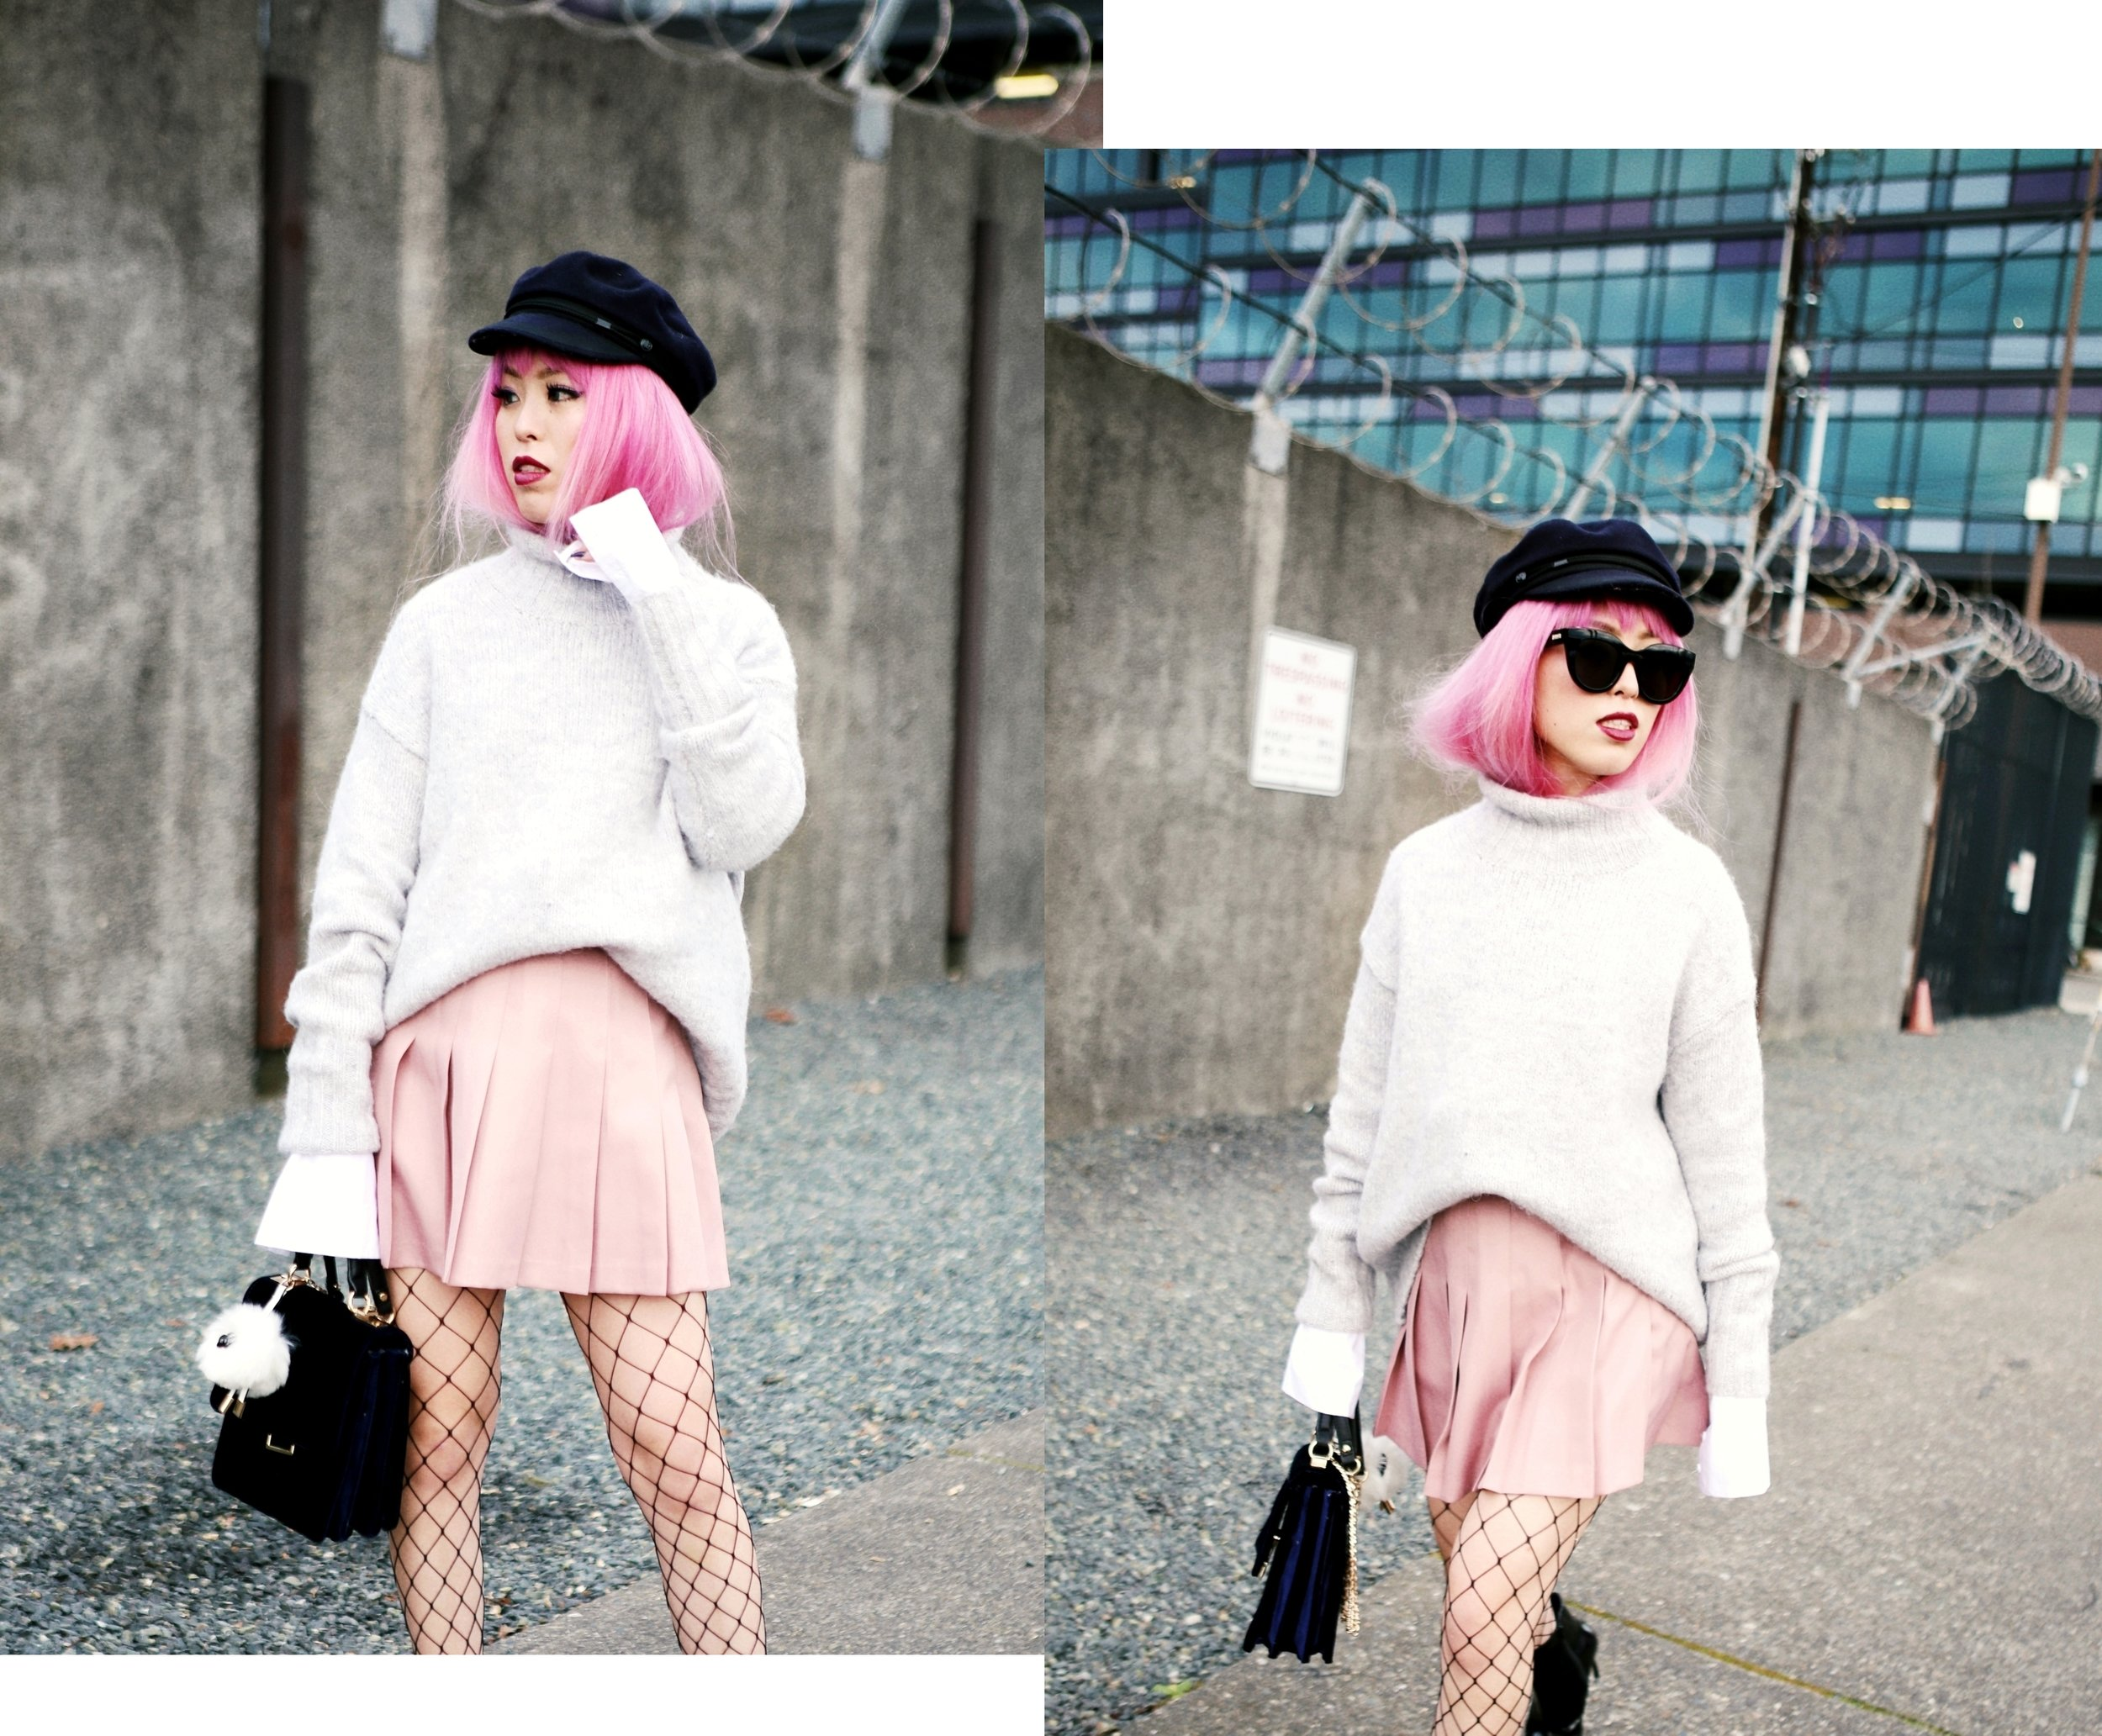 Isabel Marant News Boy Hat-H&M Gray Turtleneck Sweater-H&M Wide cuff Cotton Shirt-Forever 21 Pleated Mini Skirt-Boohoo Wide Fishnet Tights-ZARA Velvet Bag-ALDO Patent Booties-Le Specs Air Heart Sunglasses-Milani Black Cherry Lipstick-Aikas Love Closet-Seattle Style Lifestyle Blogger-japanese-pink hair 18